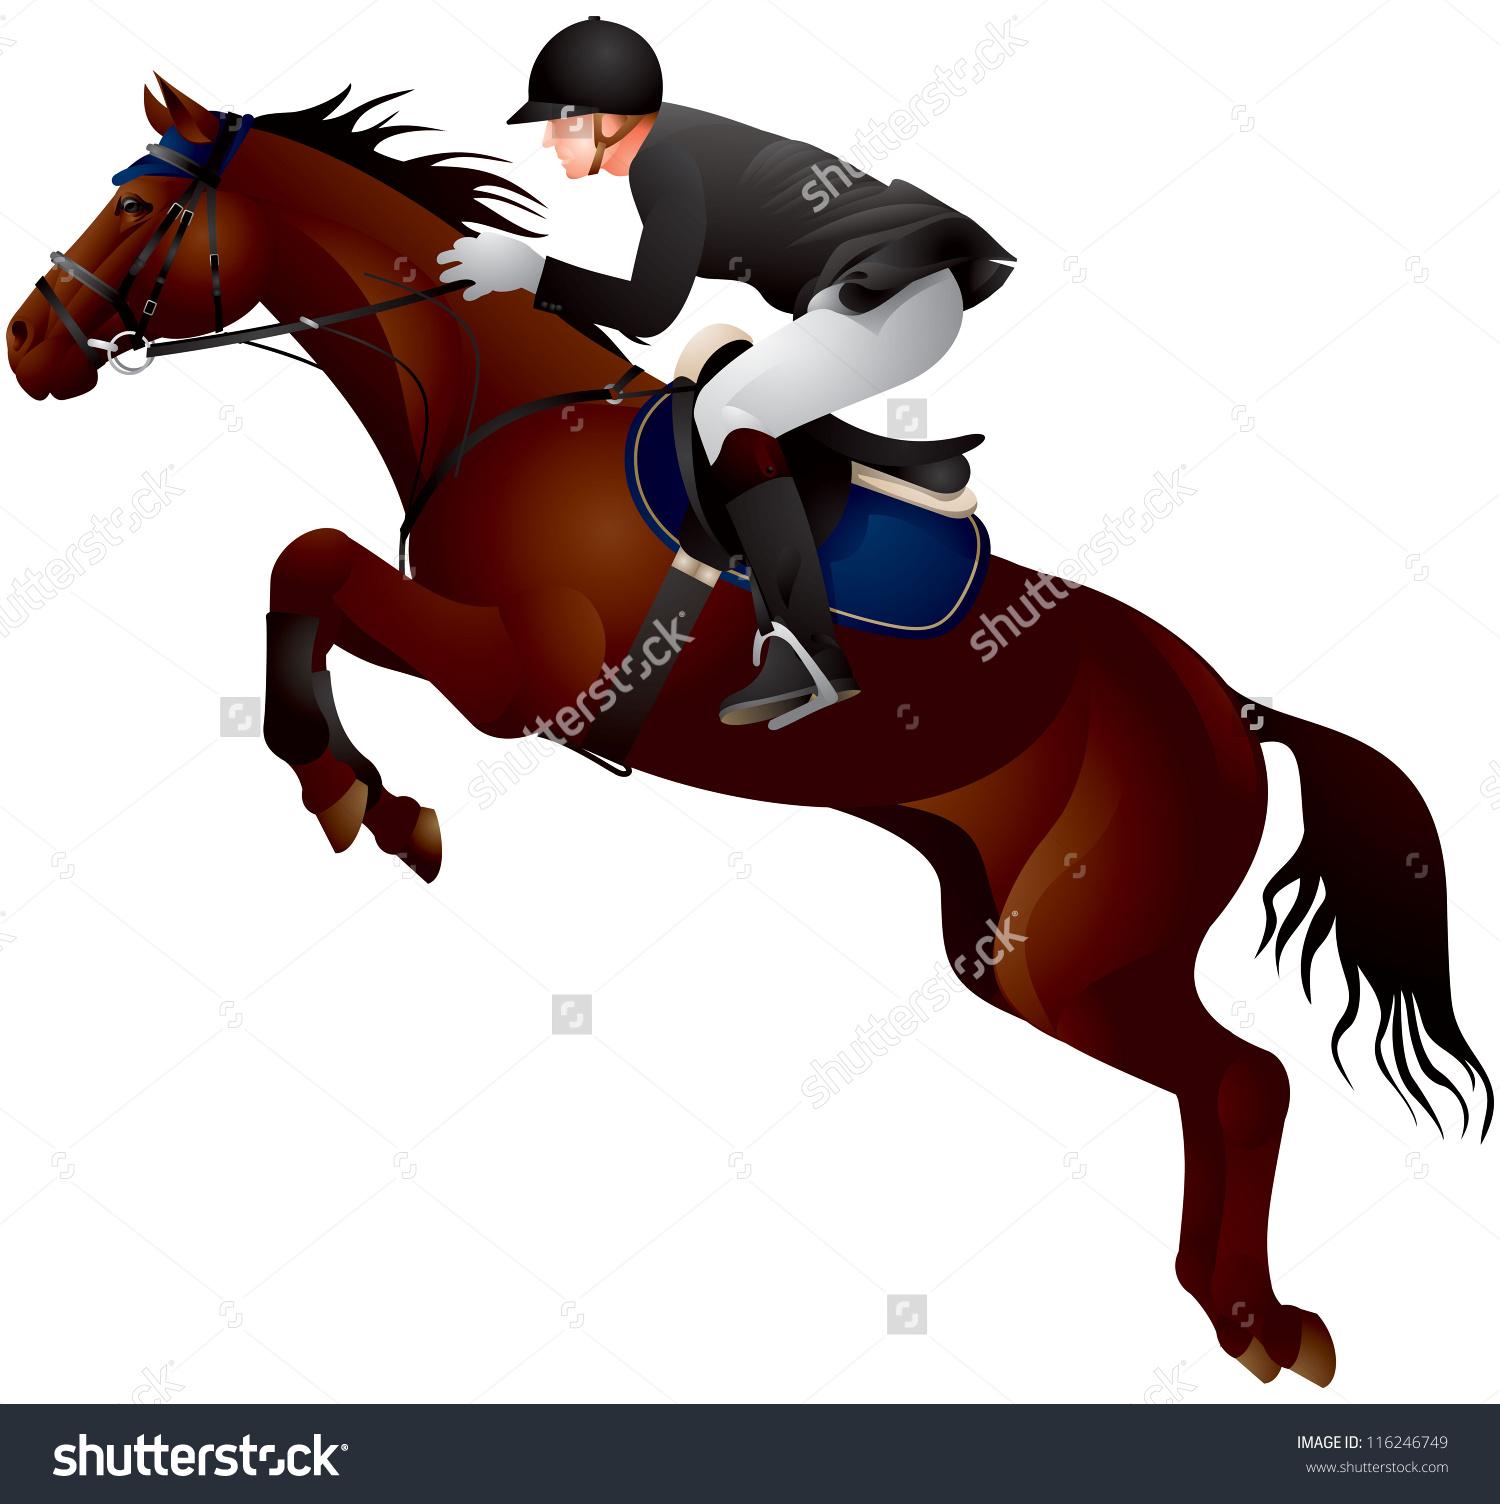 Horse Show Jumping Horse Rider Uniform Stock Vector 116246749.